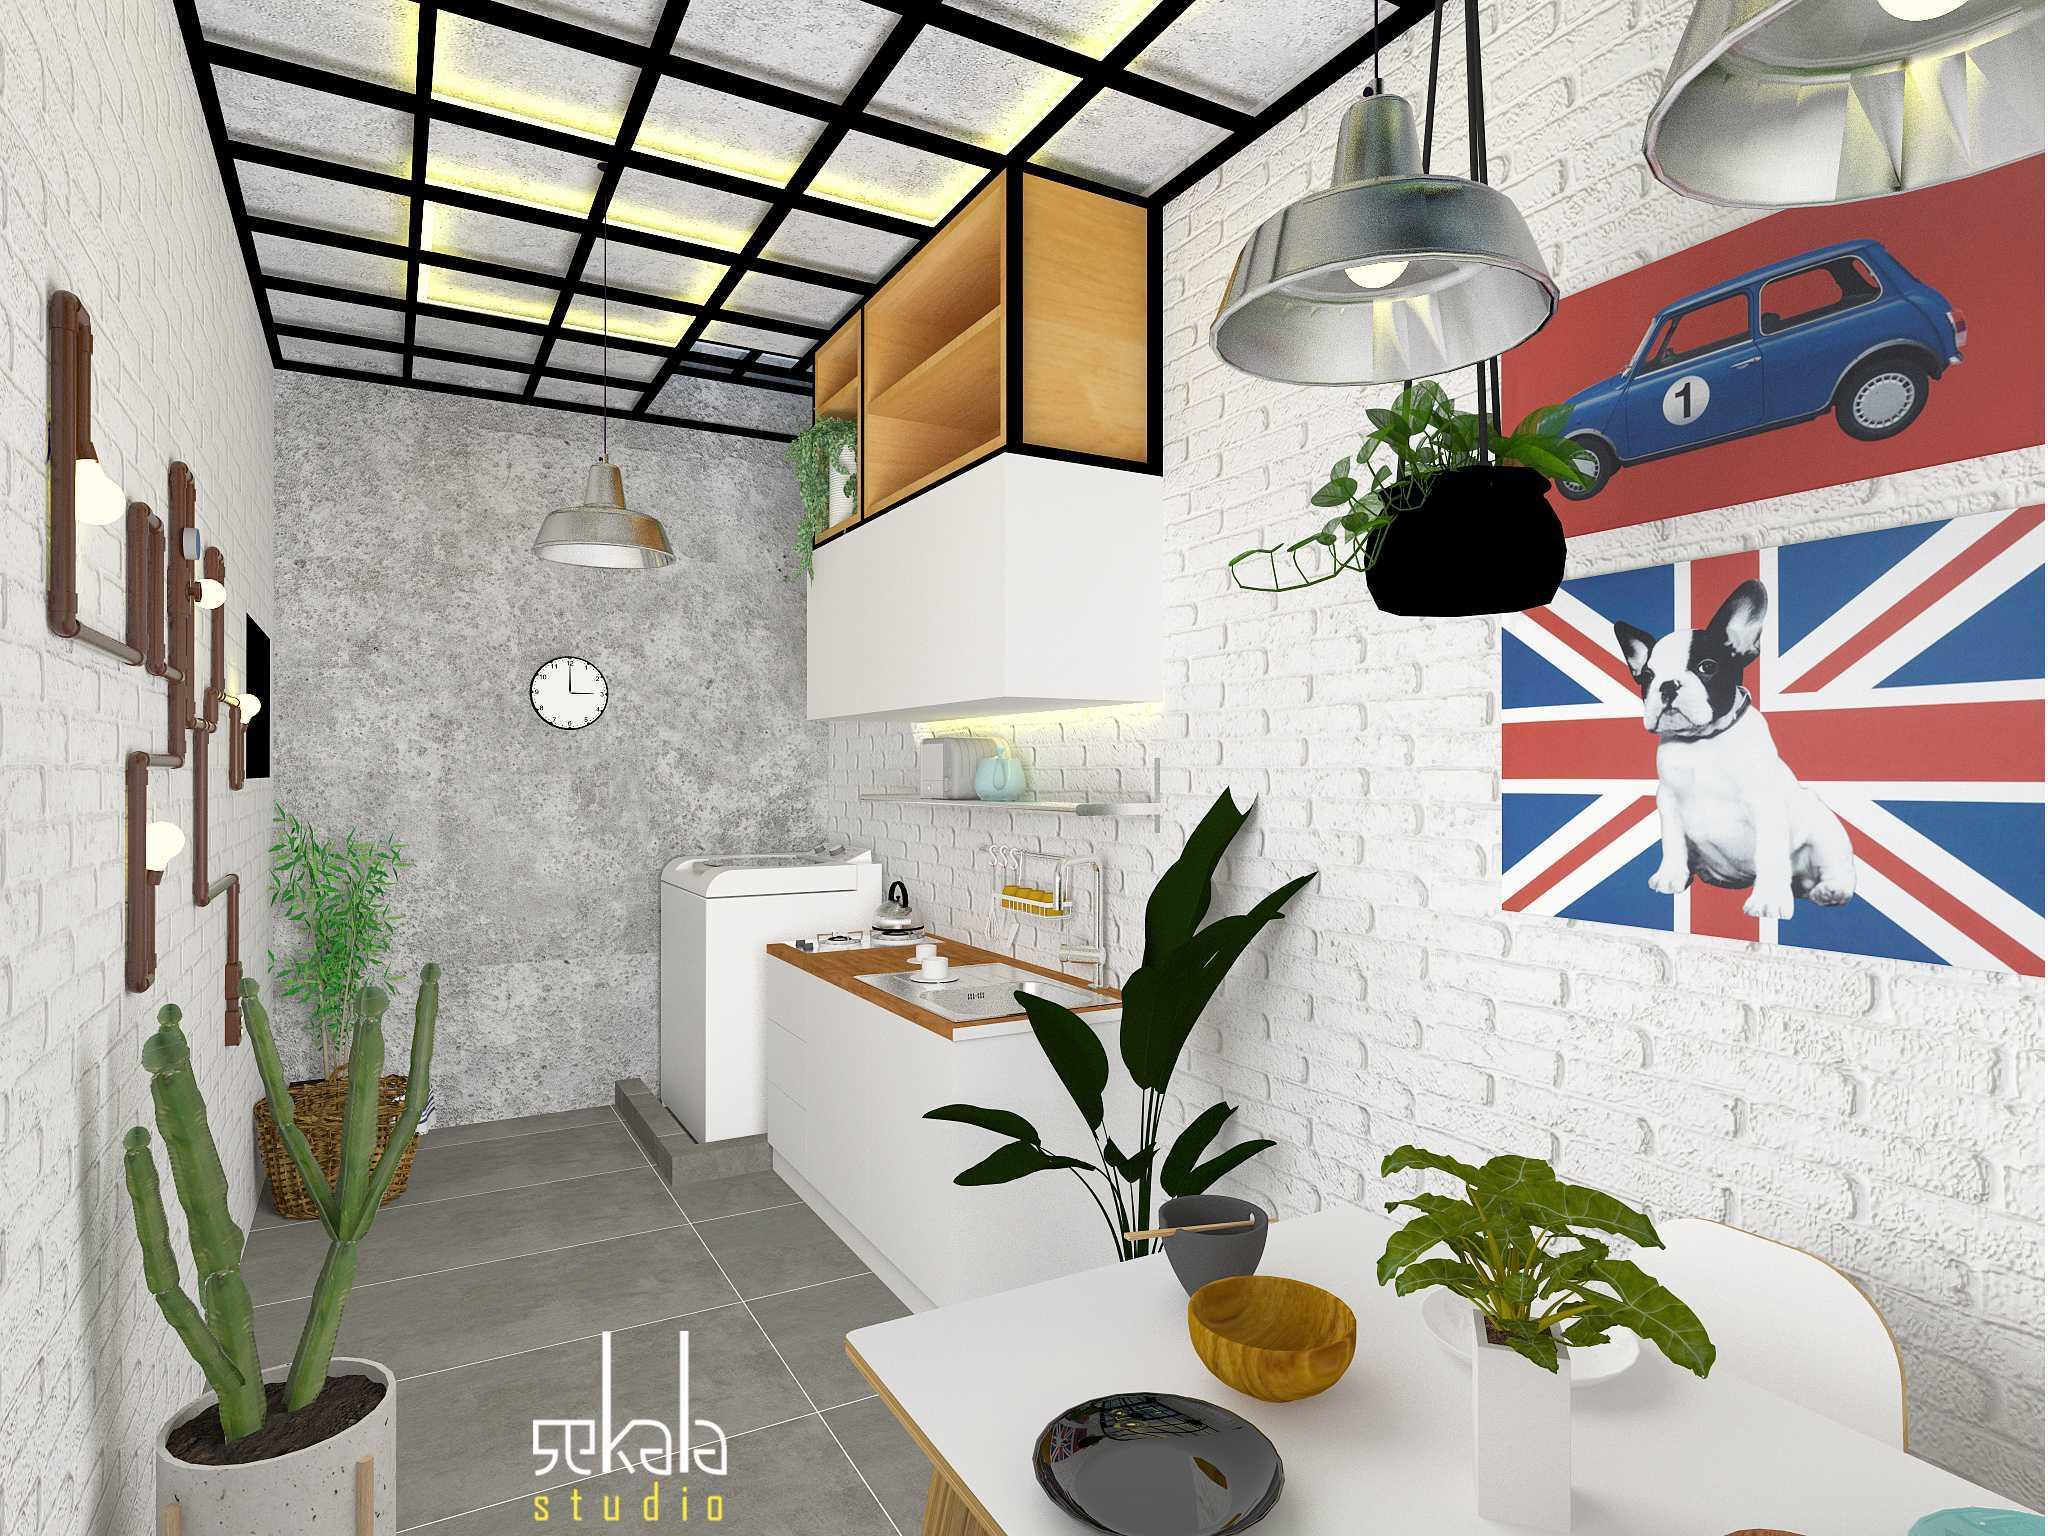 Sekala Interior Rumah Krian Krian, Kabupaten Sidoarjo, Jawa Timur, Indonesia Krian, Kabupaten Sidoarjo, Jawa Timur, Indonesia Sekala-Interior-Rumah-Bpk-Tyo  58304